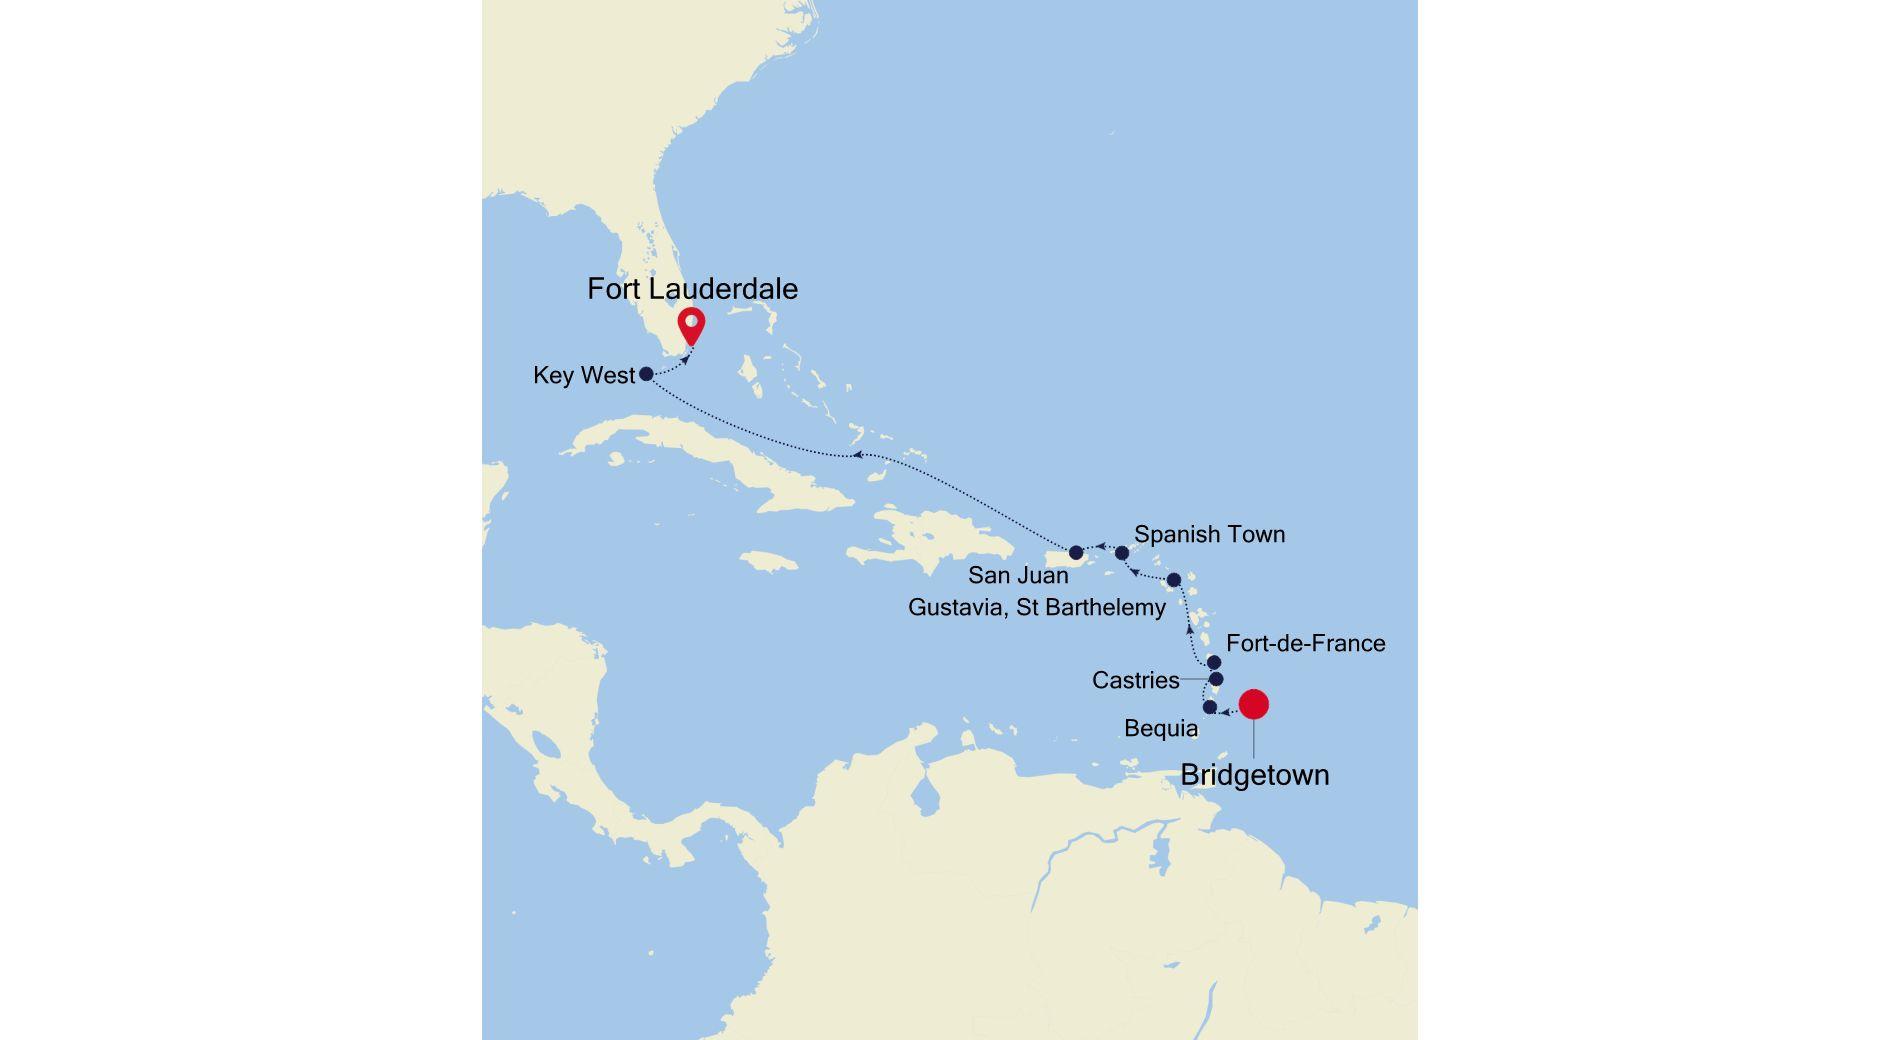 SS200114010 - Bridgetown à Fort Lauderdale